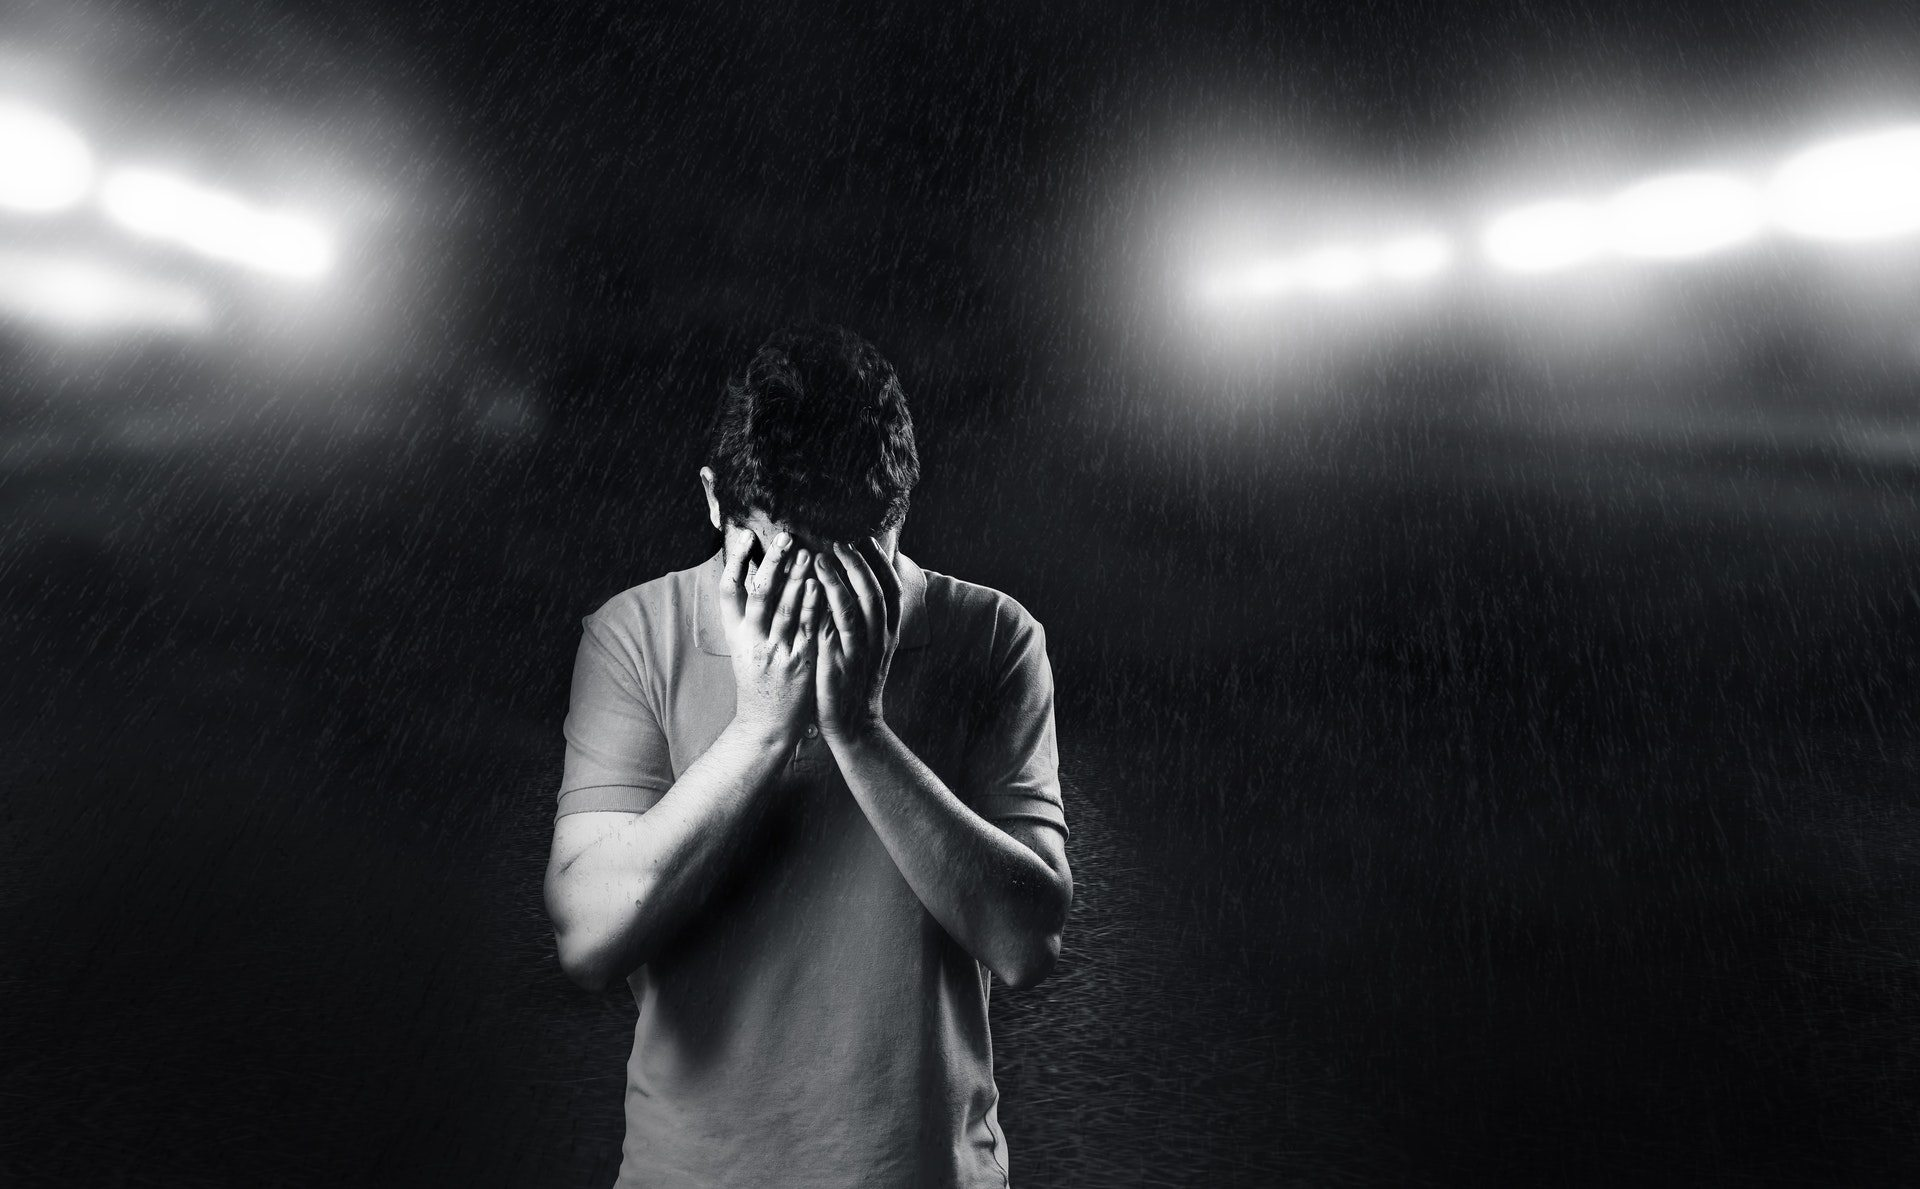 Sad Boy Alone In Rain Wallpaper Posted By Ryan Tremblay